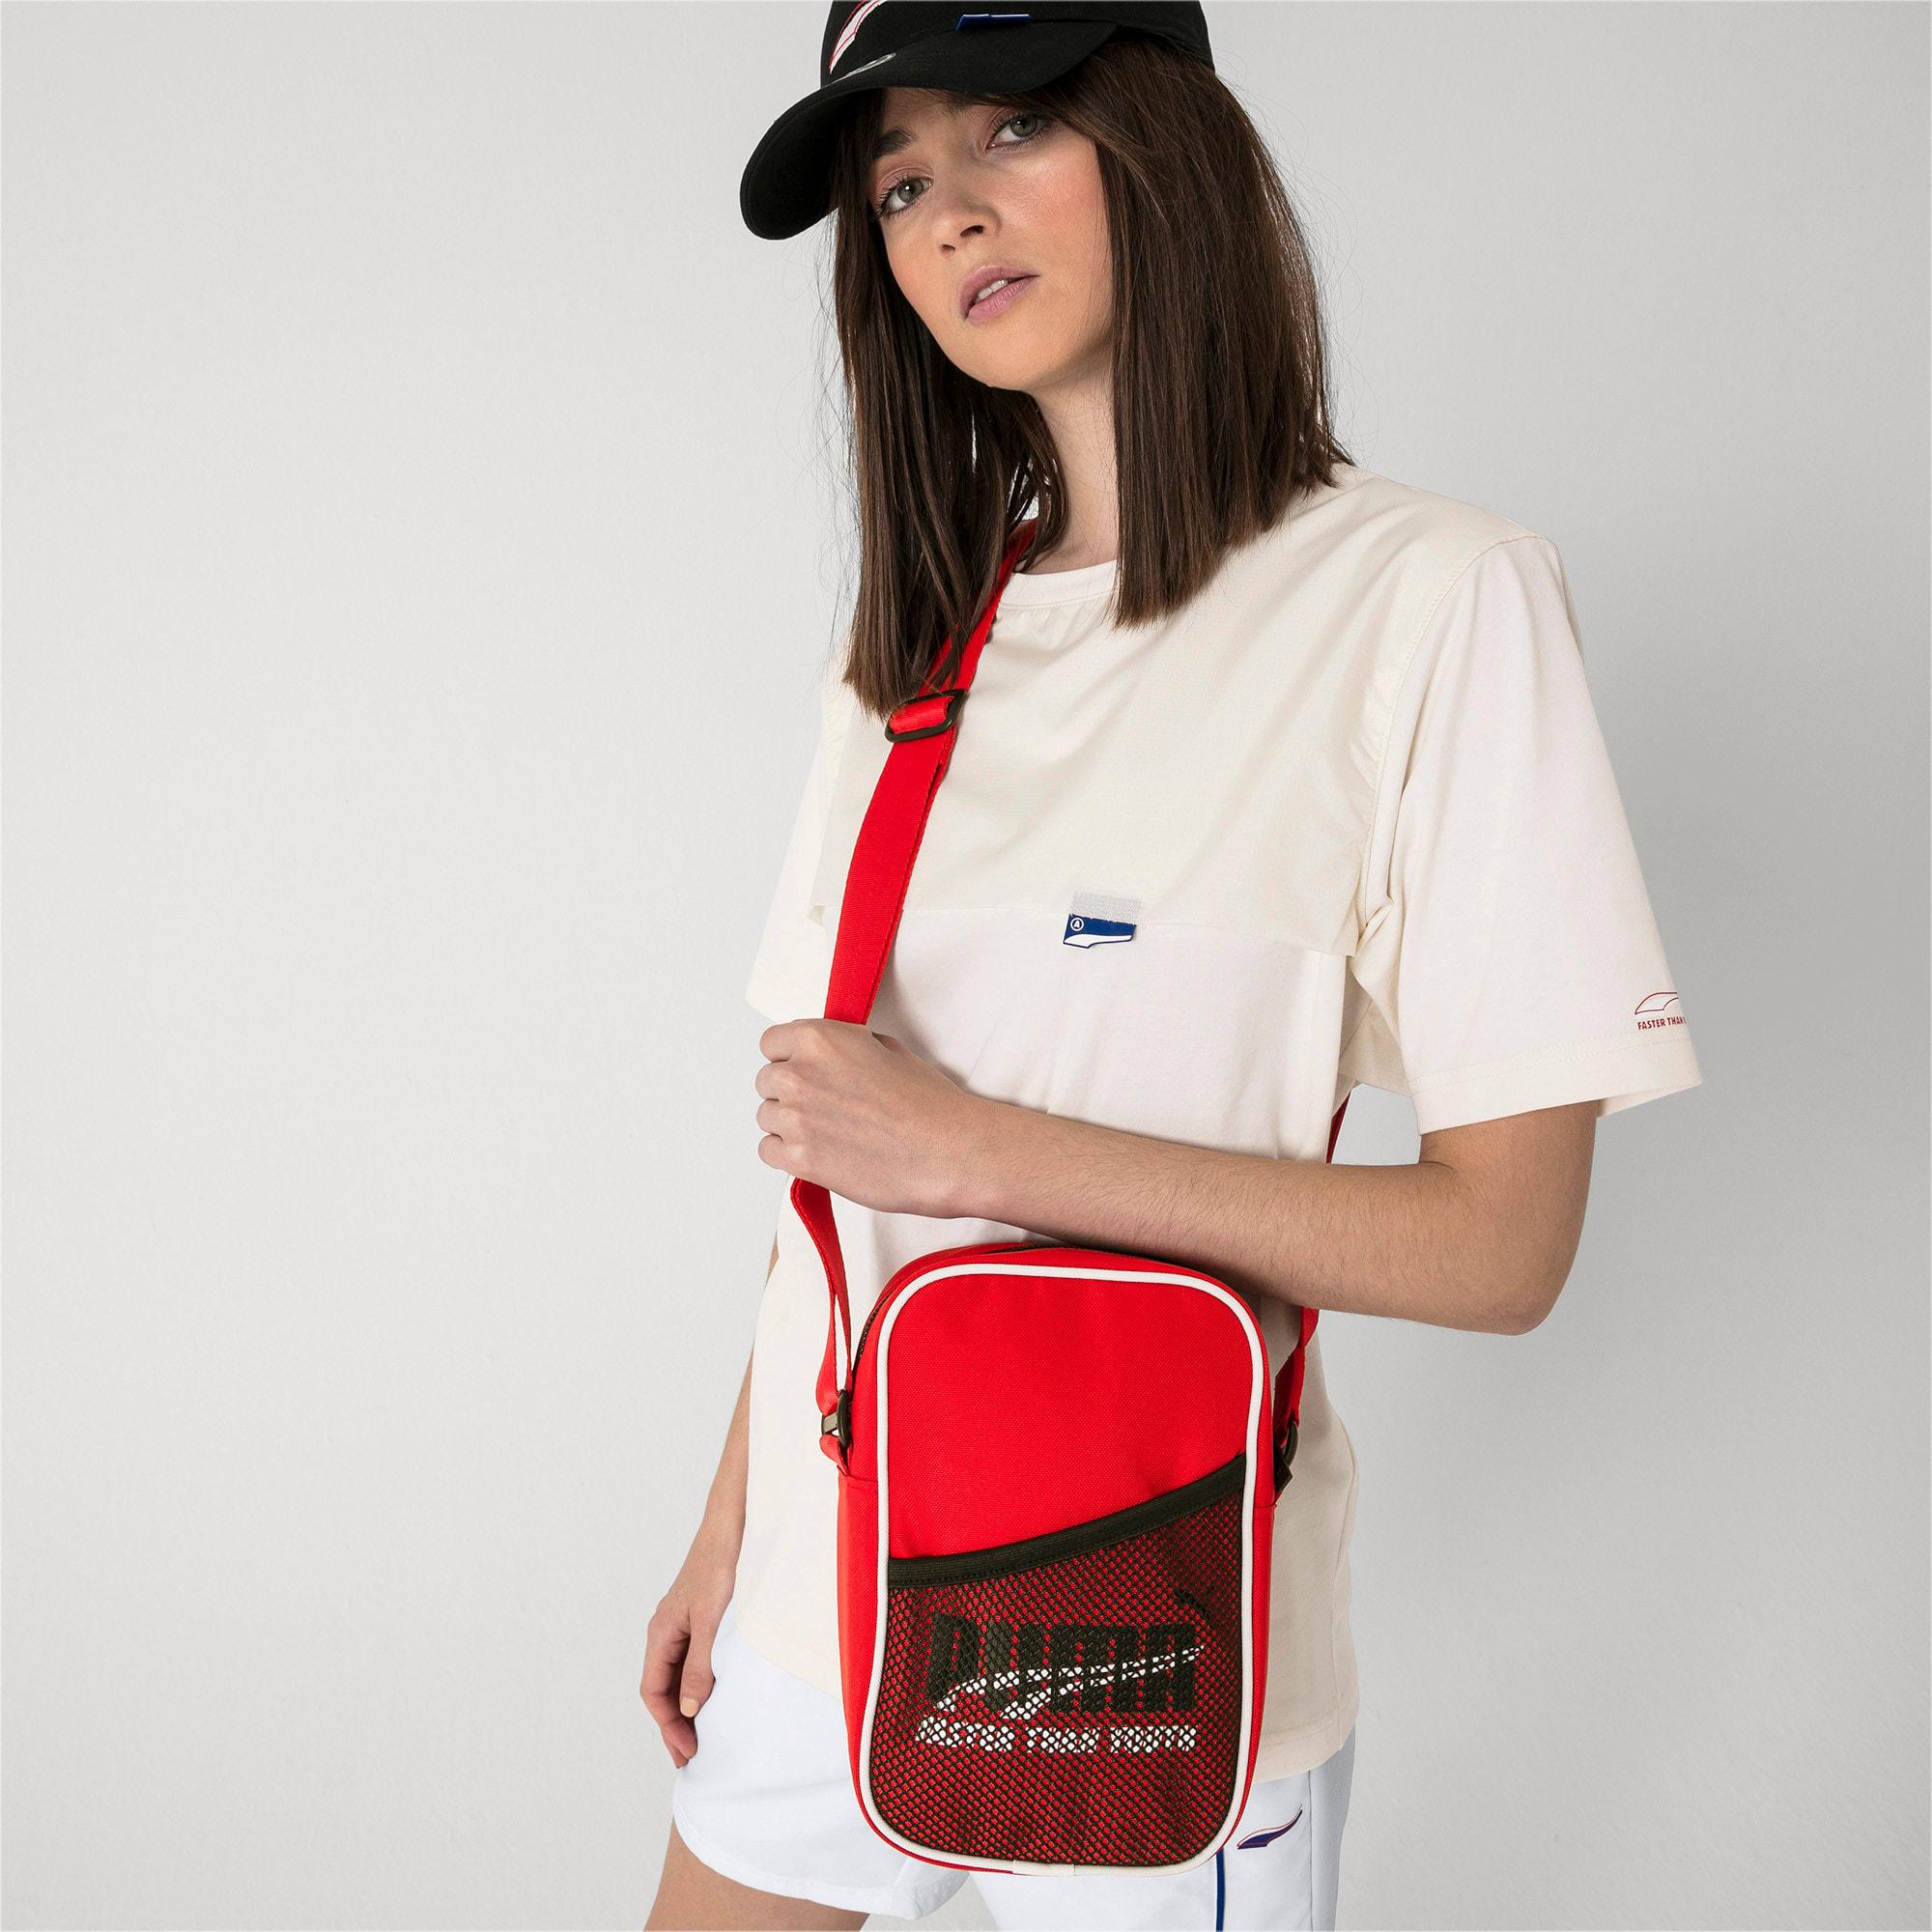 Thumbnail 6 of PUMA x ADER ERROR Portable Bag, Puma Red, medium